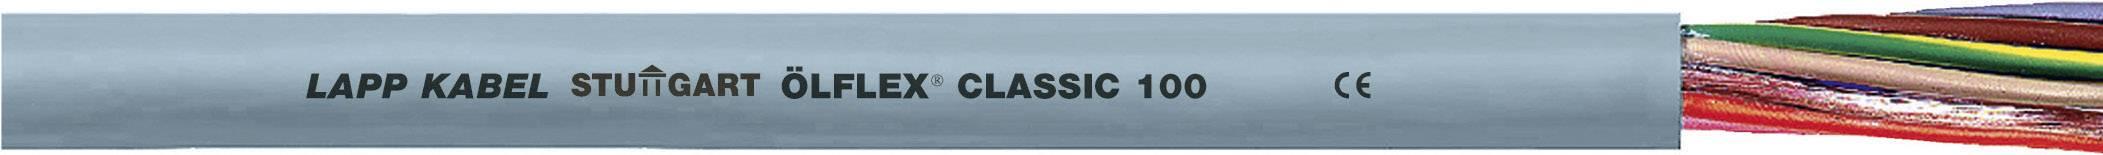 Kabel LappKabel Ölflex CLASSIC 100 12G0,5 (0010008), PVC, 8,9 mm, 500 V, šedá, 100 m